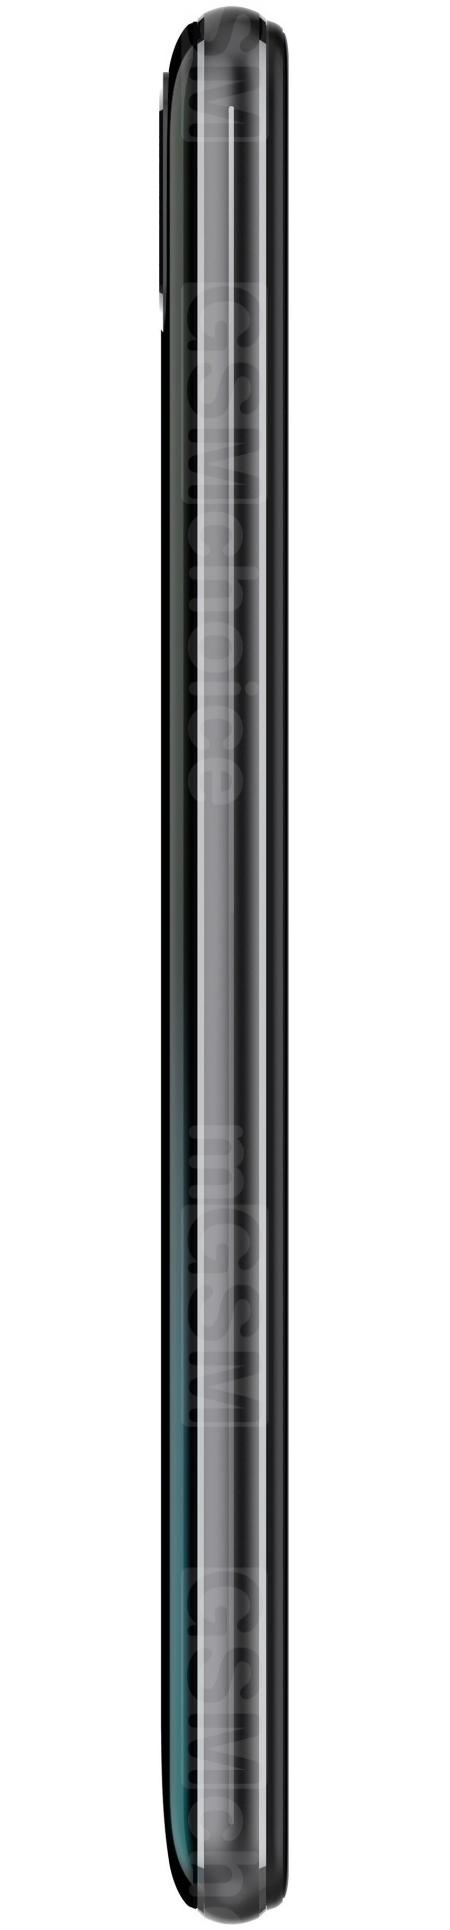 Lava Z51